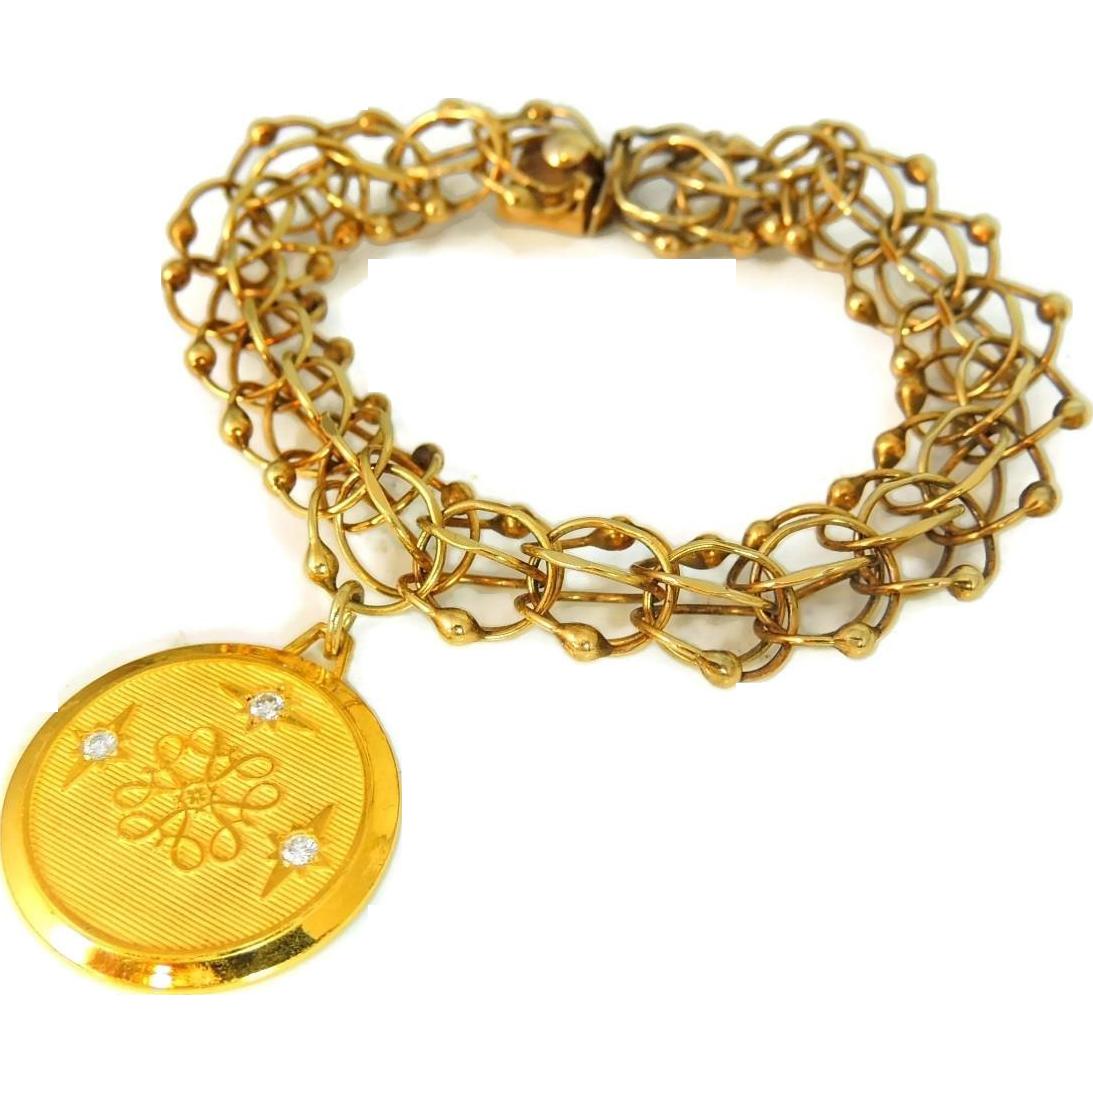 14k Gold Fancy Bracelet With 10k Big Charm General Electric Ge Diamond Charm Vintage Diamond Charm Charm Bracelet Link Bracelets